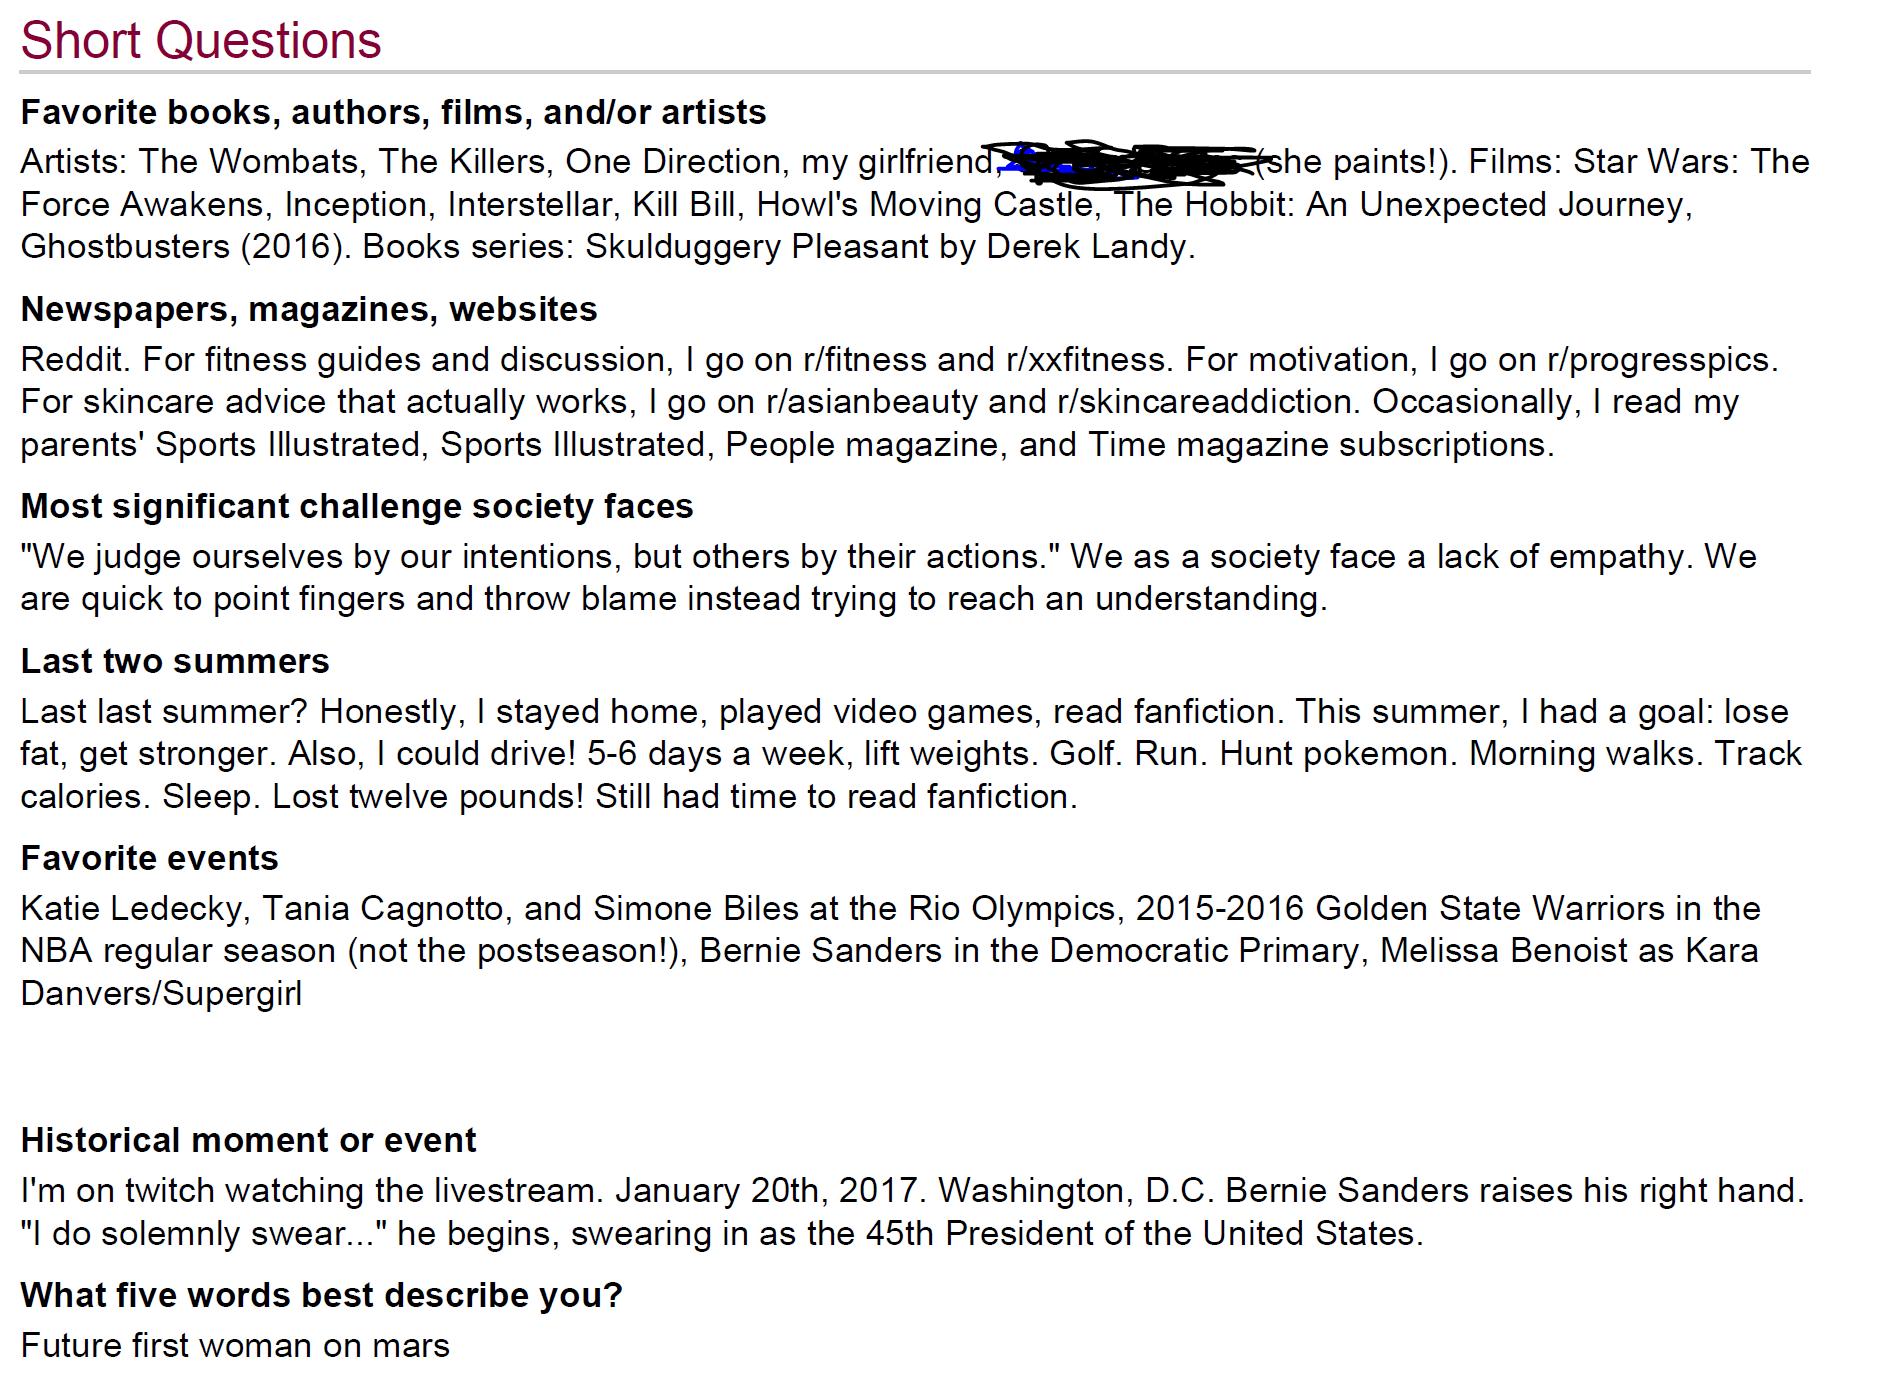 accepted stanford essays reddit